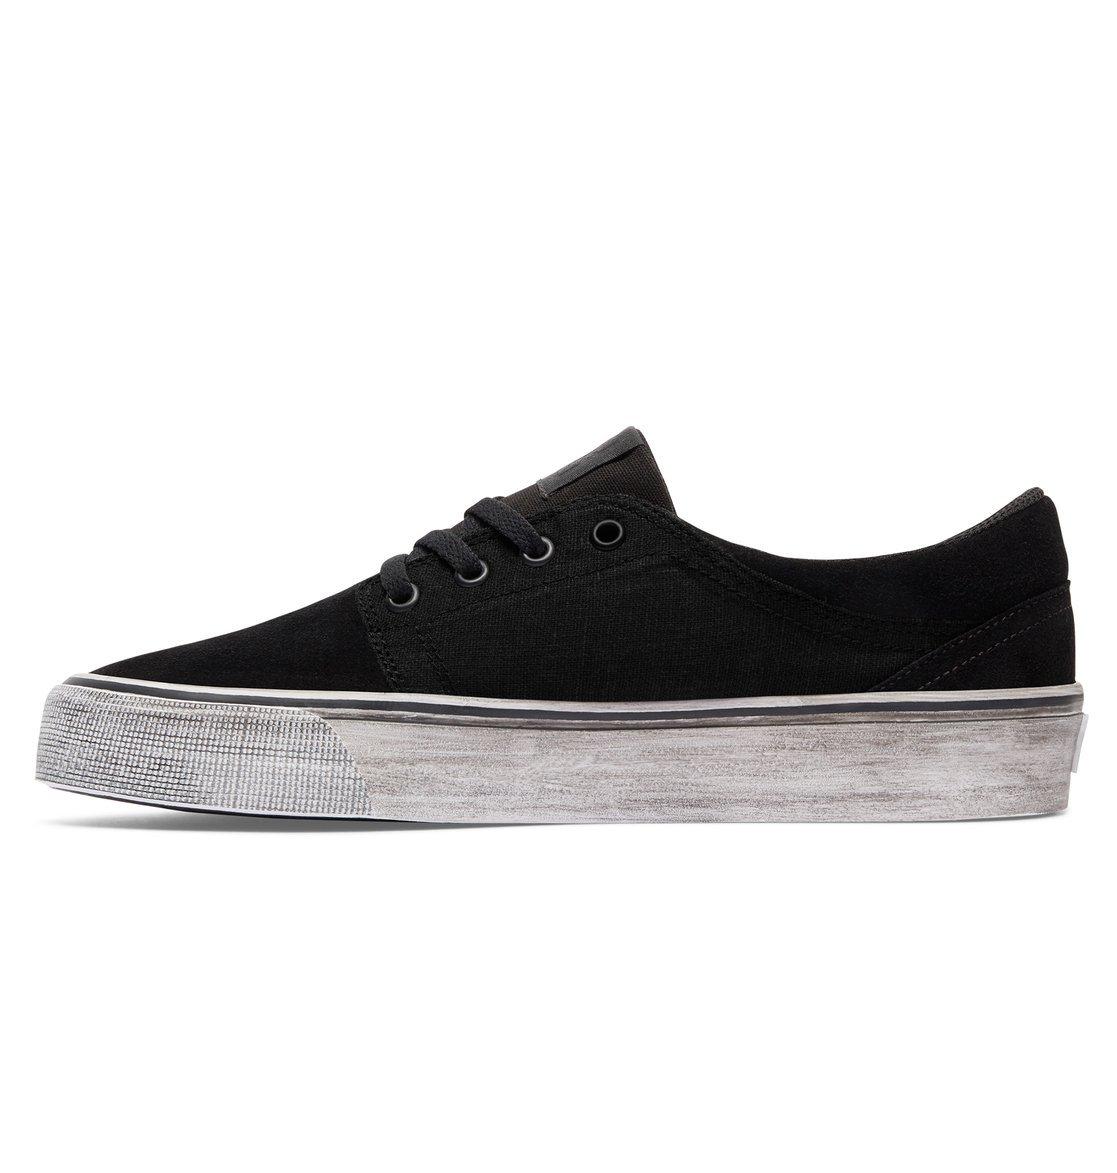 DC Women's Trase SE Skateboarding Shoe B01L3M2XDA 9.5 B(M) US|Black Acid